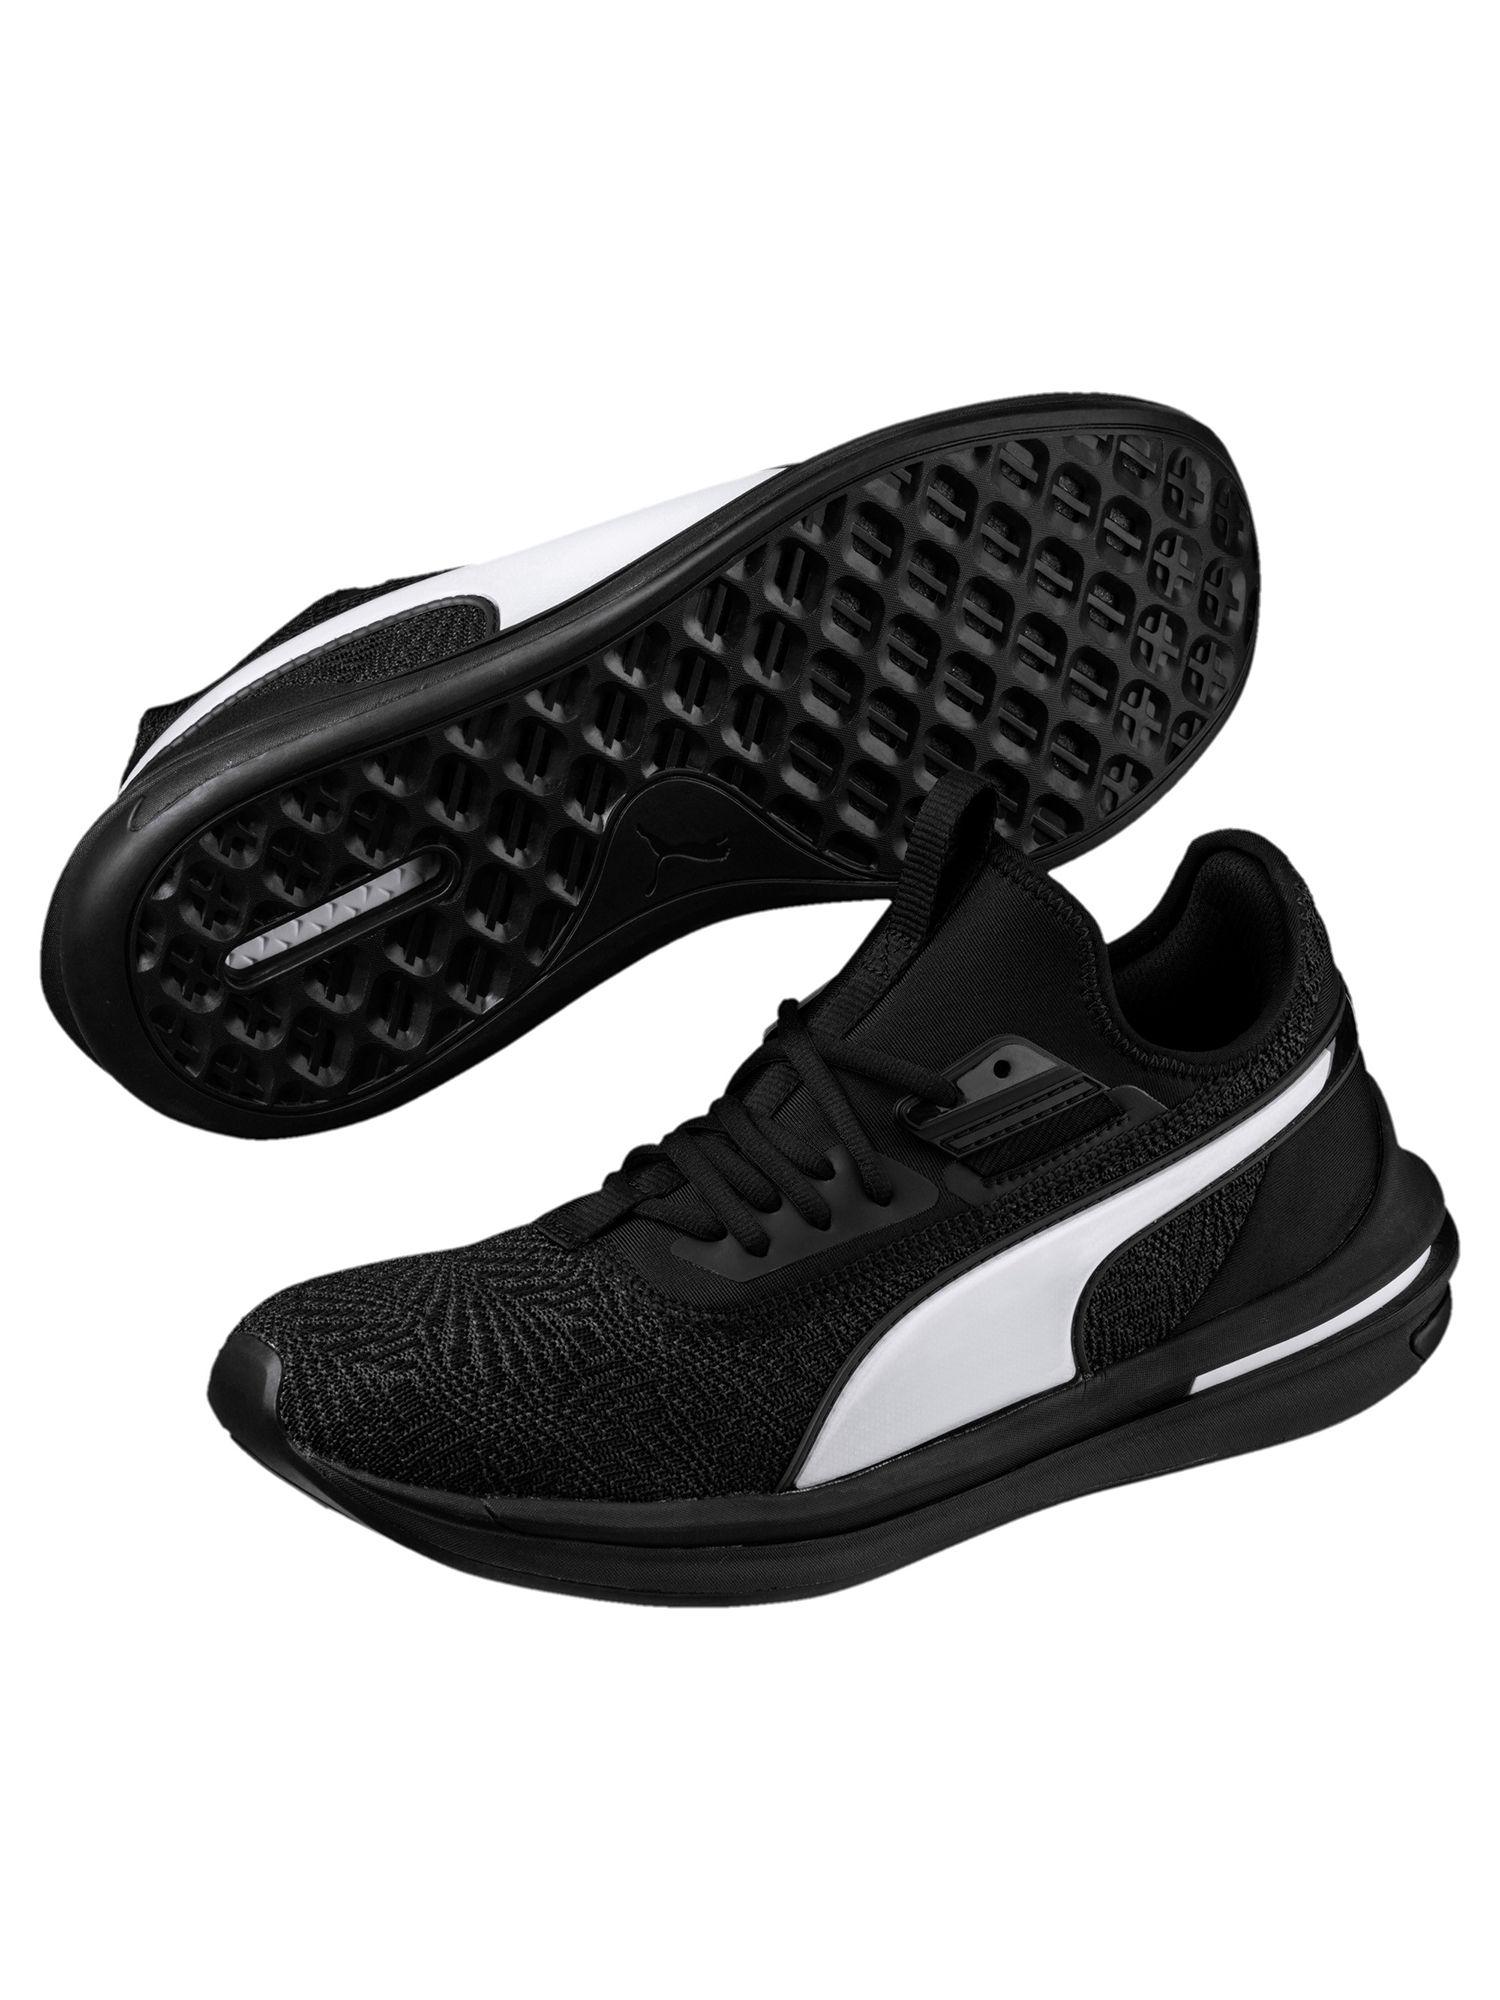 Puma Black IGNITE Limitless SR-71 Shoes